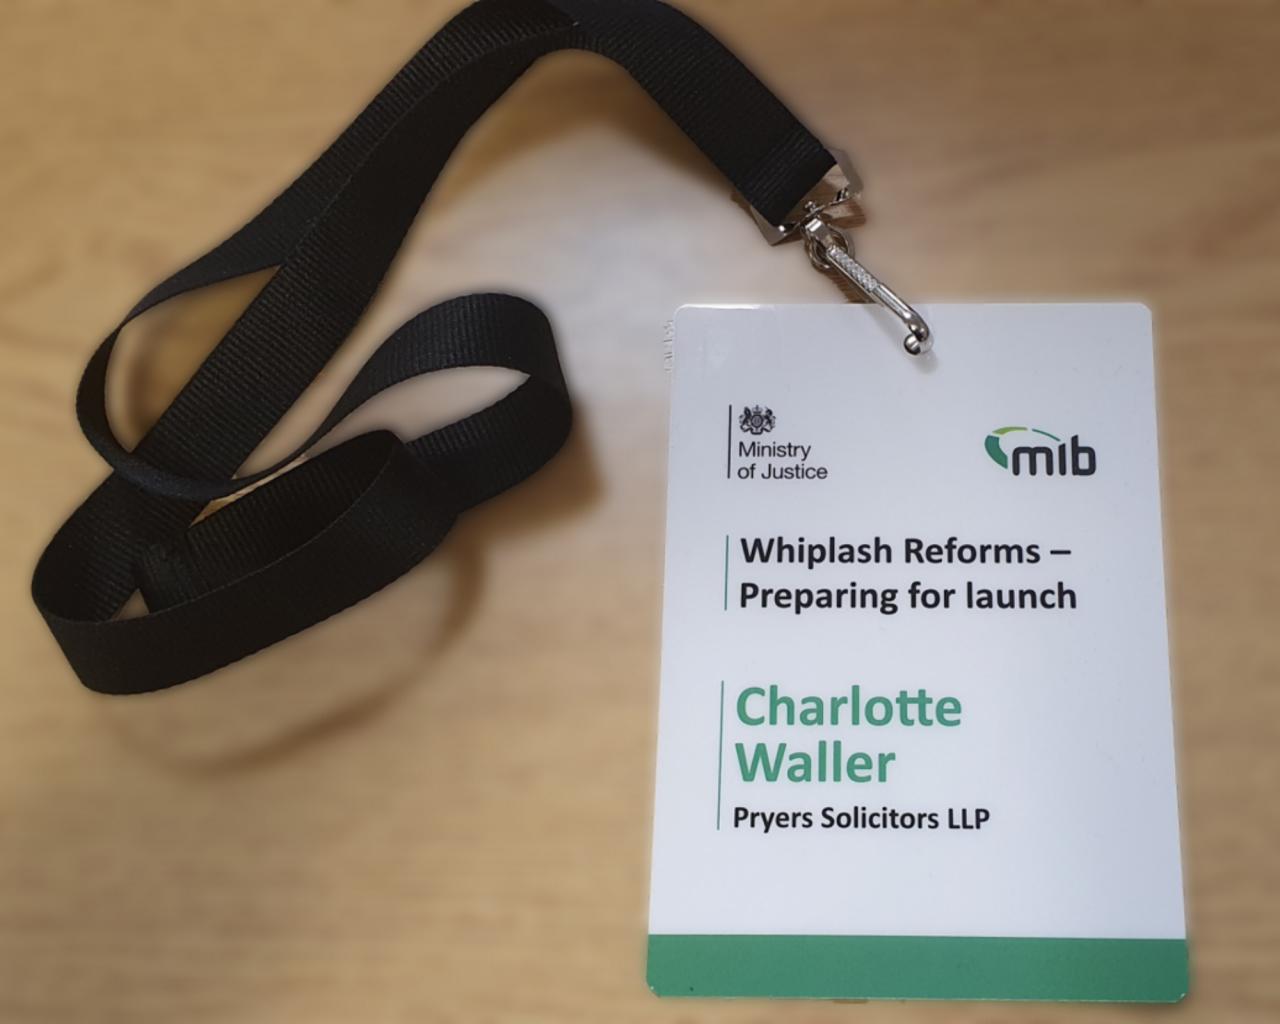 Whiplash Reforms Badge